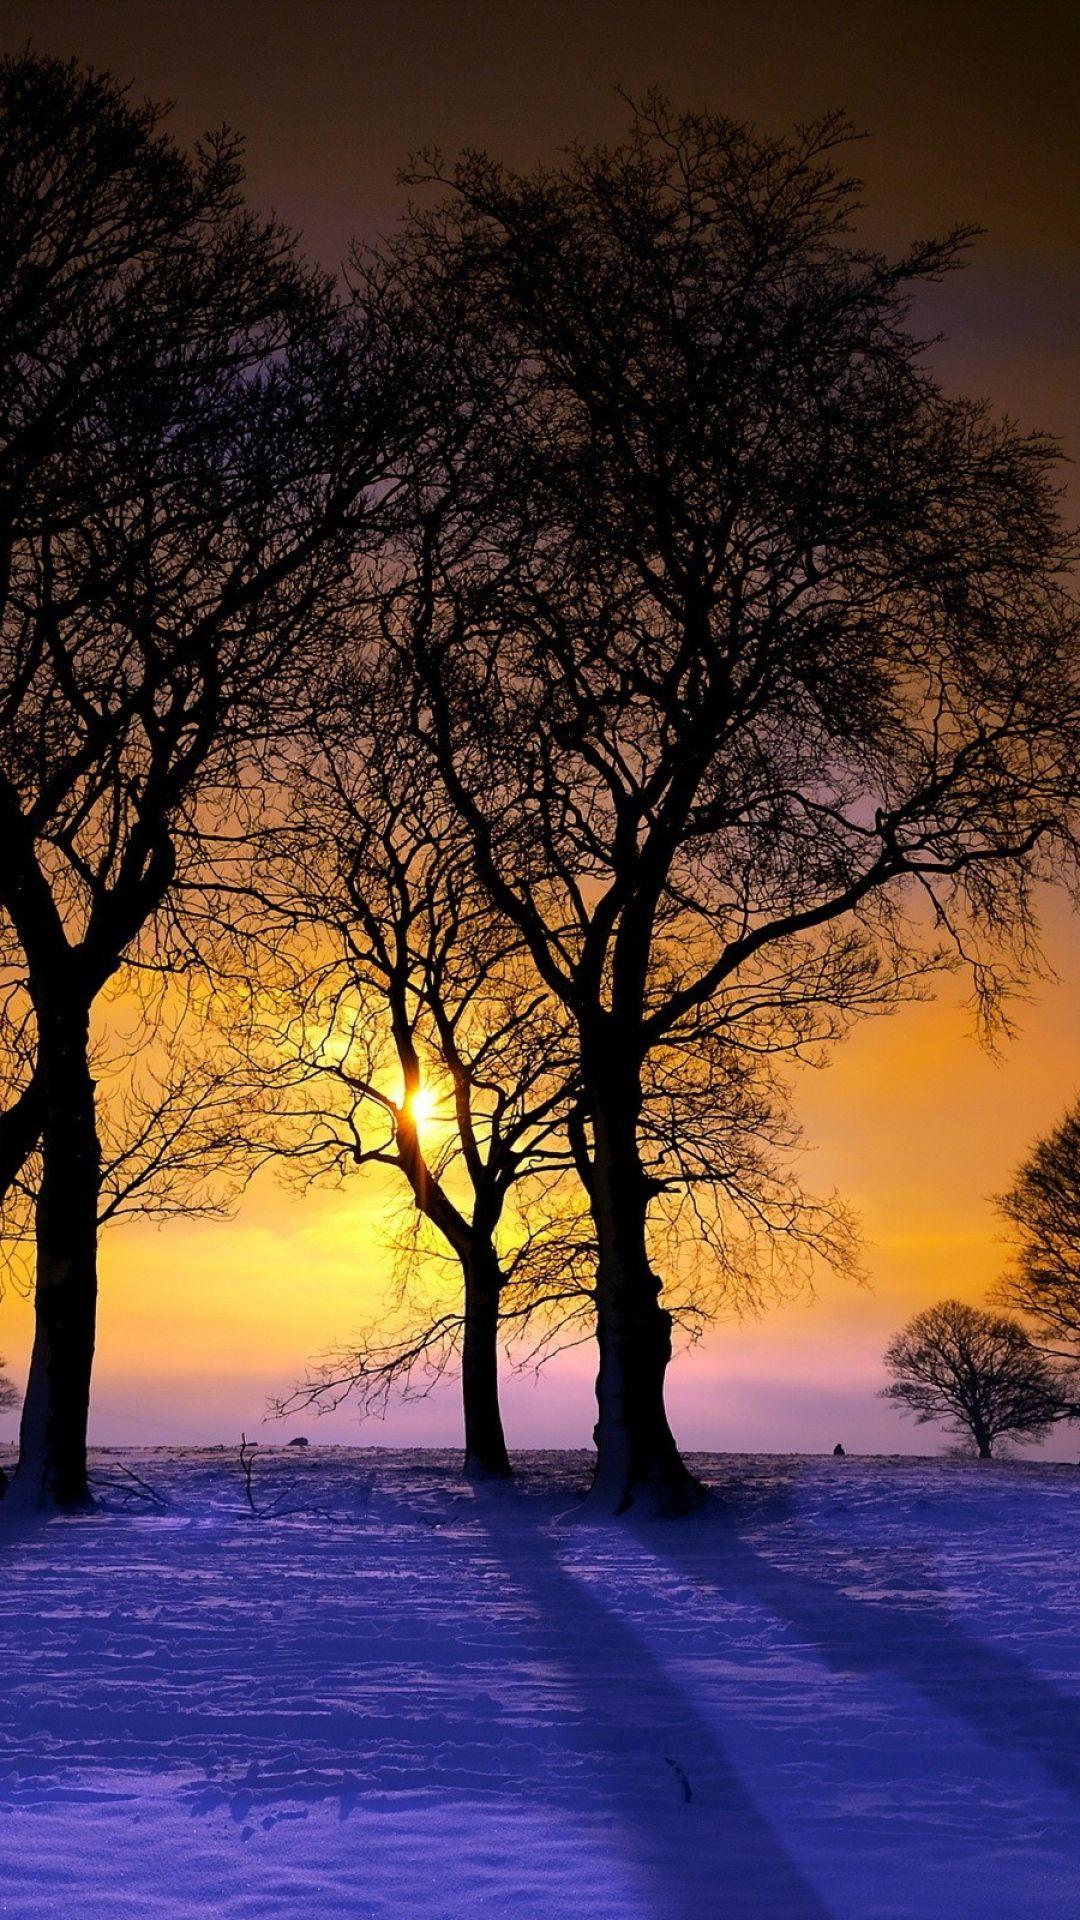 download wallpaper 1080x1920 sunset, winter, trees, landscape sony